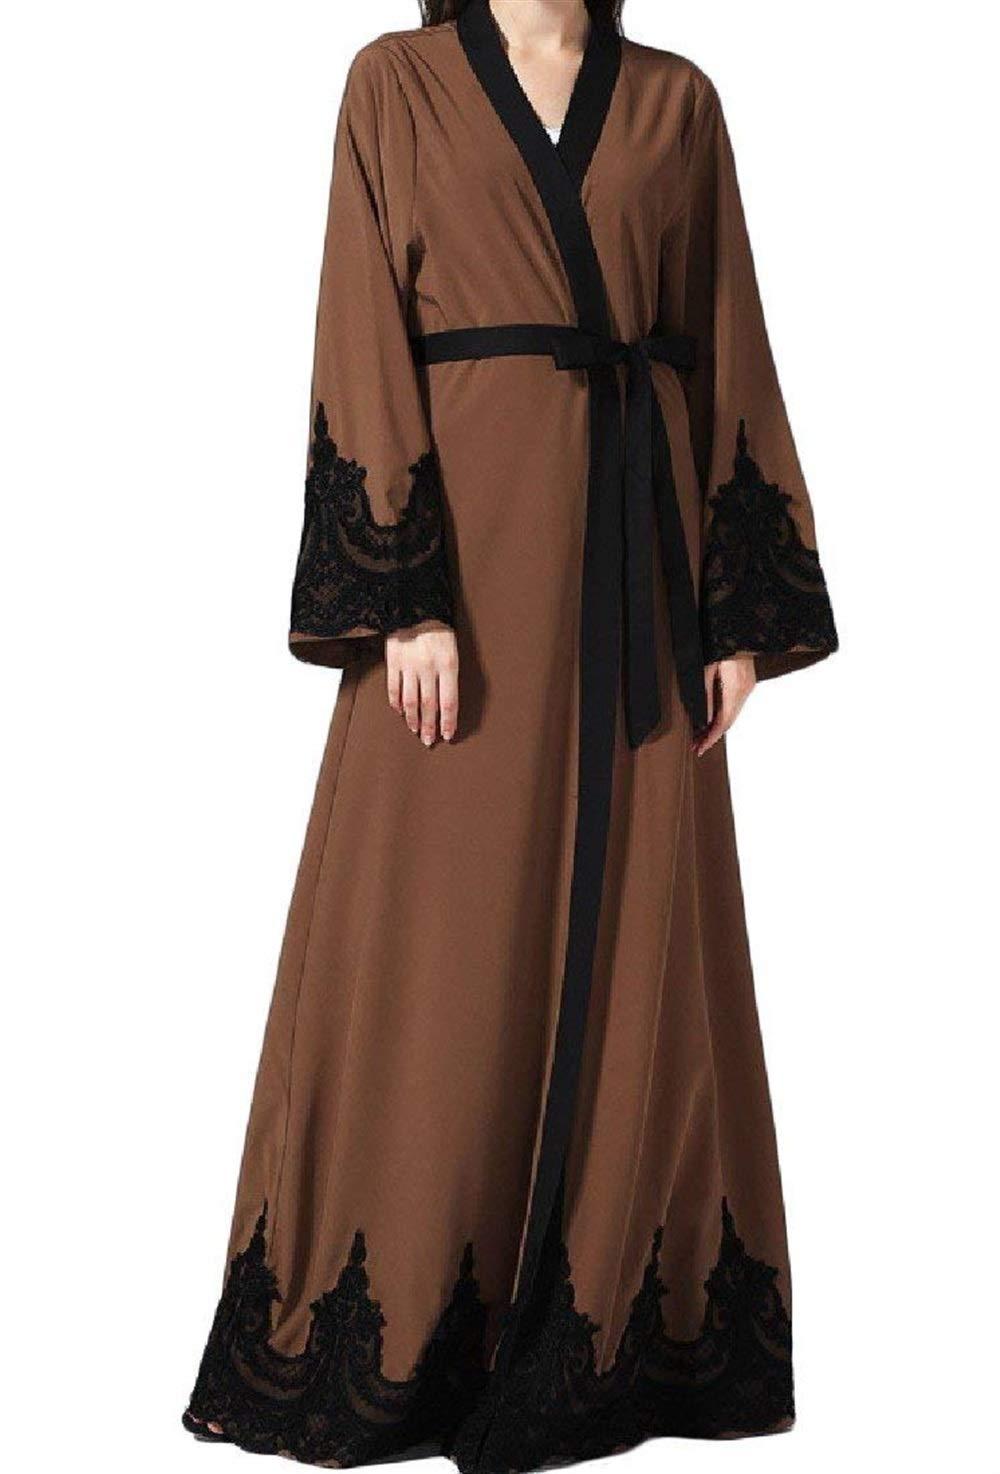 Brown Joyccu Women Turkey Arab Cardigan Gowns Middle East Long Dress